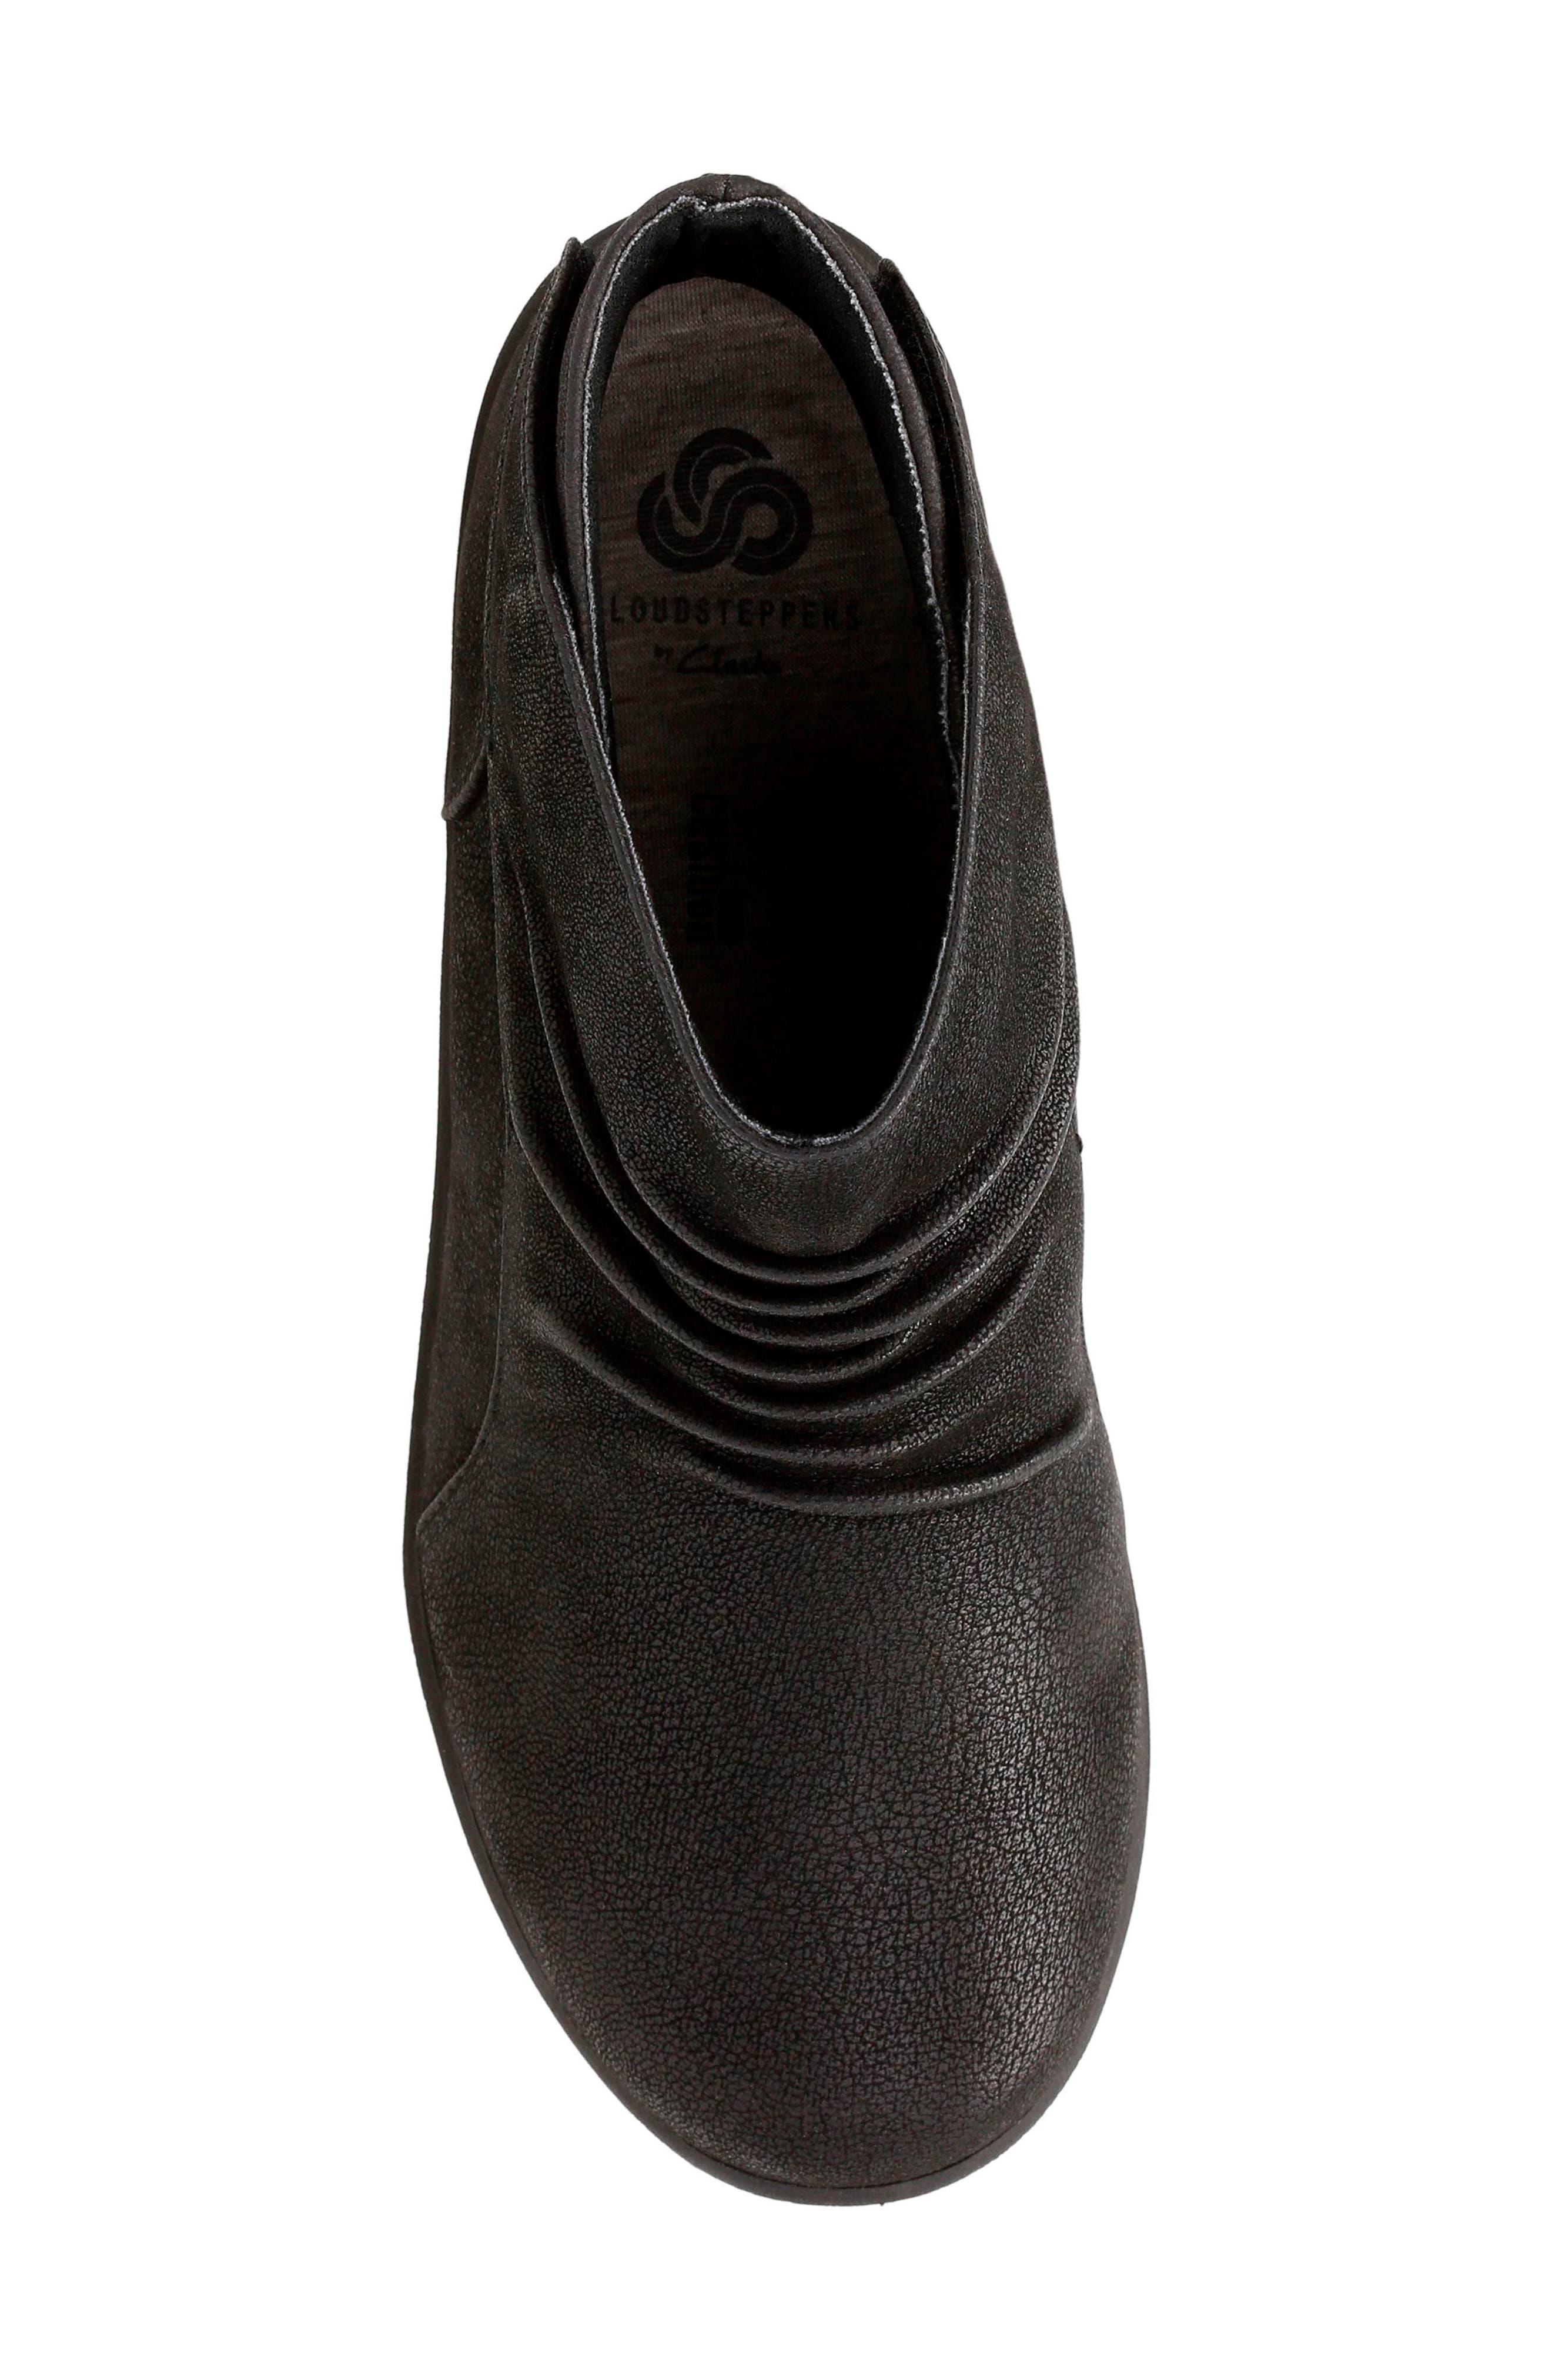 Sillian Sway Boot,                             Alternate thumbnail 5, color,                             Black Fabric